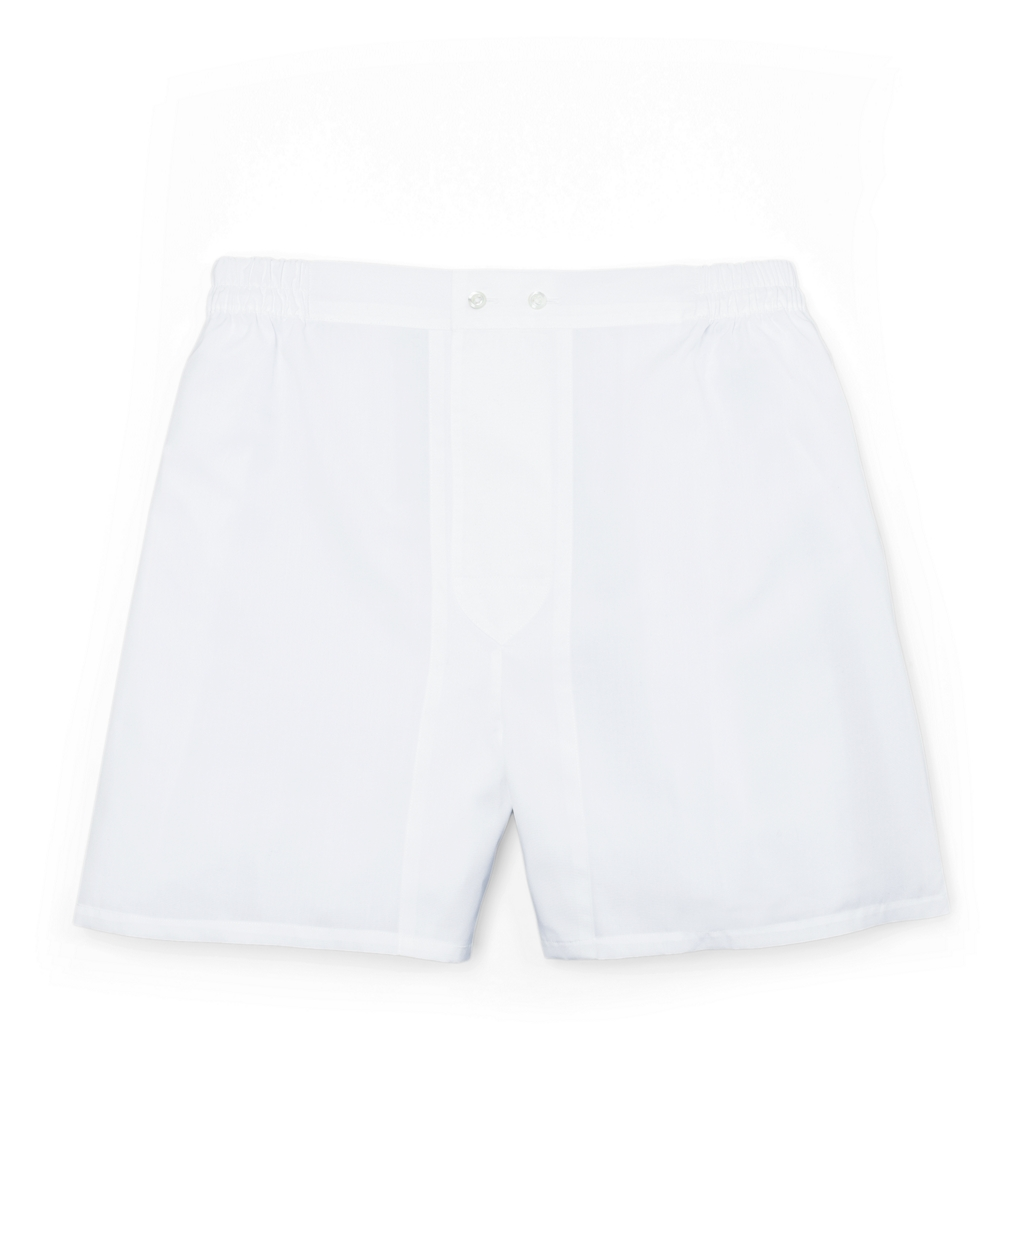 Vintage Men's Underwear Brooks Brothers Mens Luxury Boxers $31.50 AT vintagedancer.com